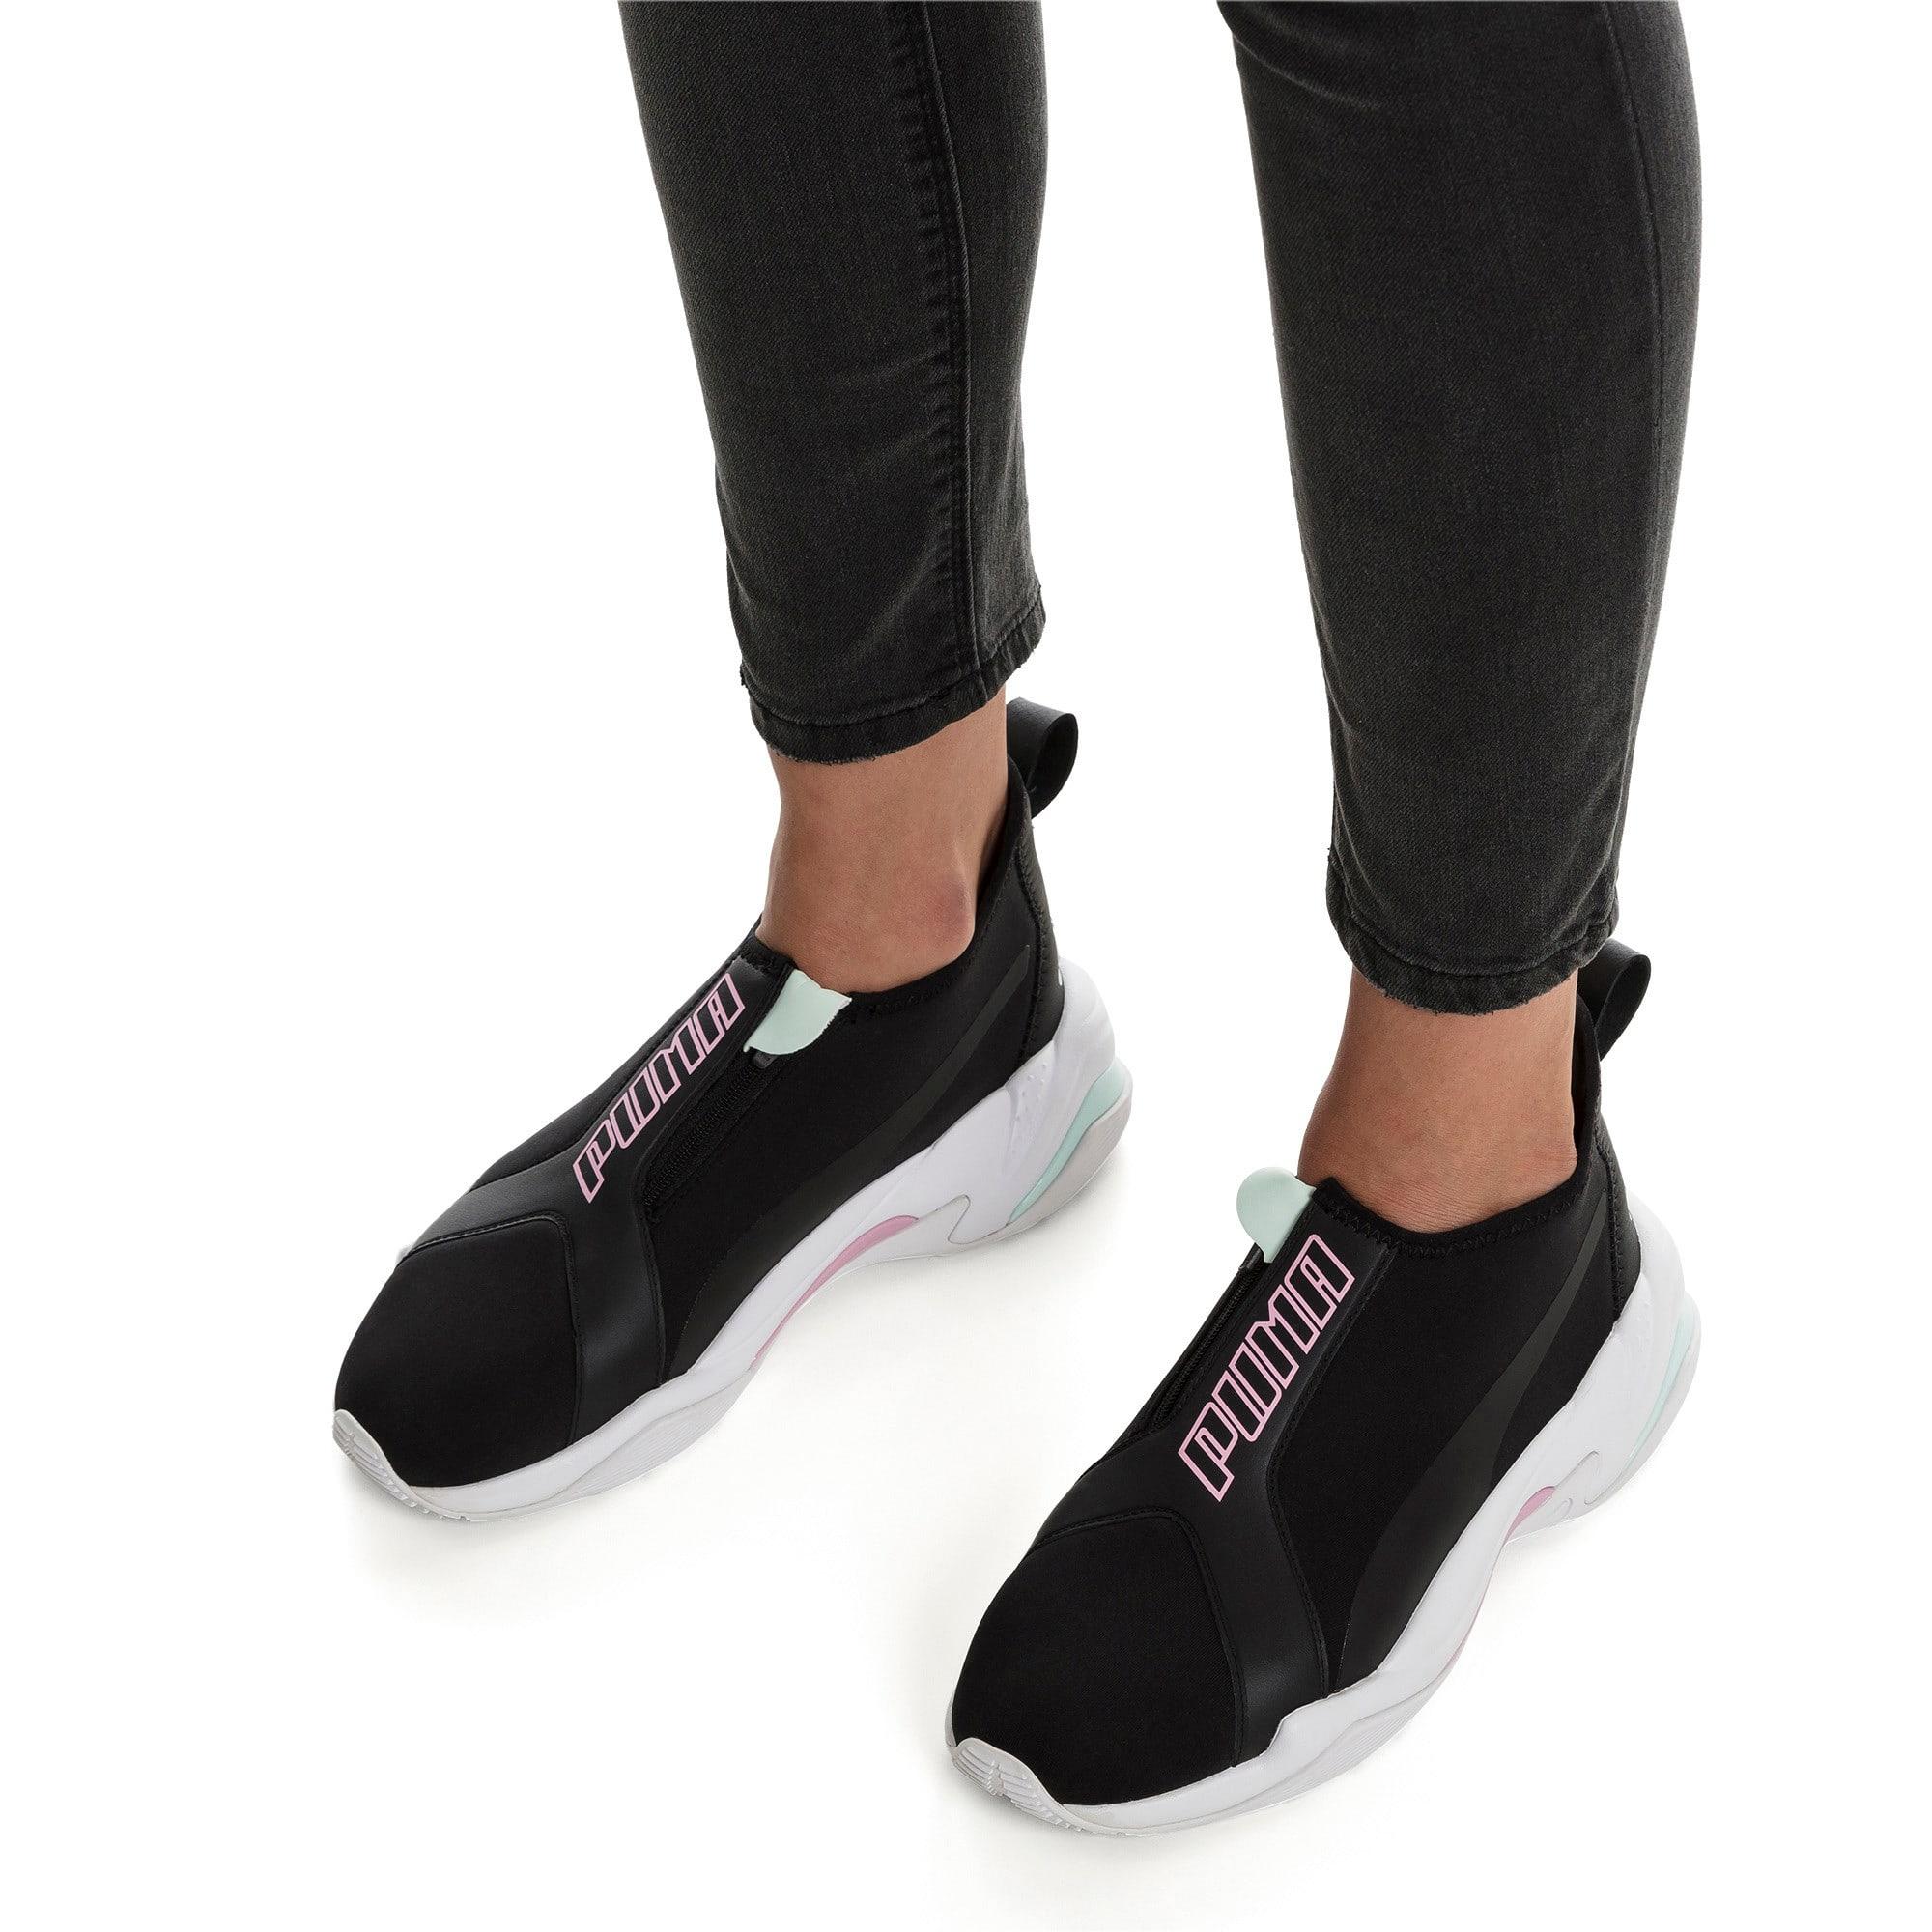 Miniatura 2 de Zapatos deportivos para mujer Thunder Trailblazer, Puma Black-Pale Pink, mediano